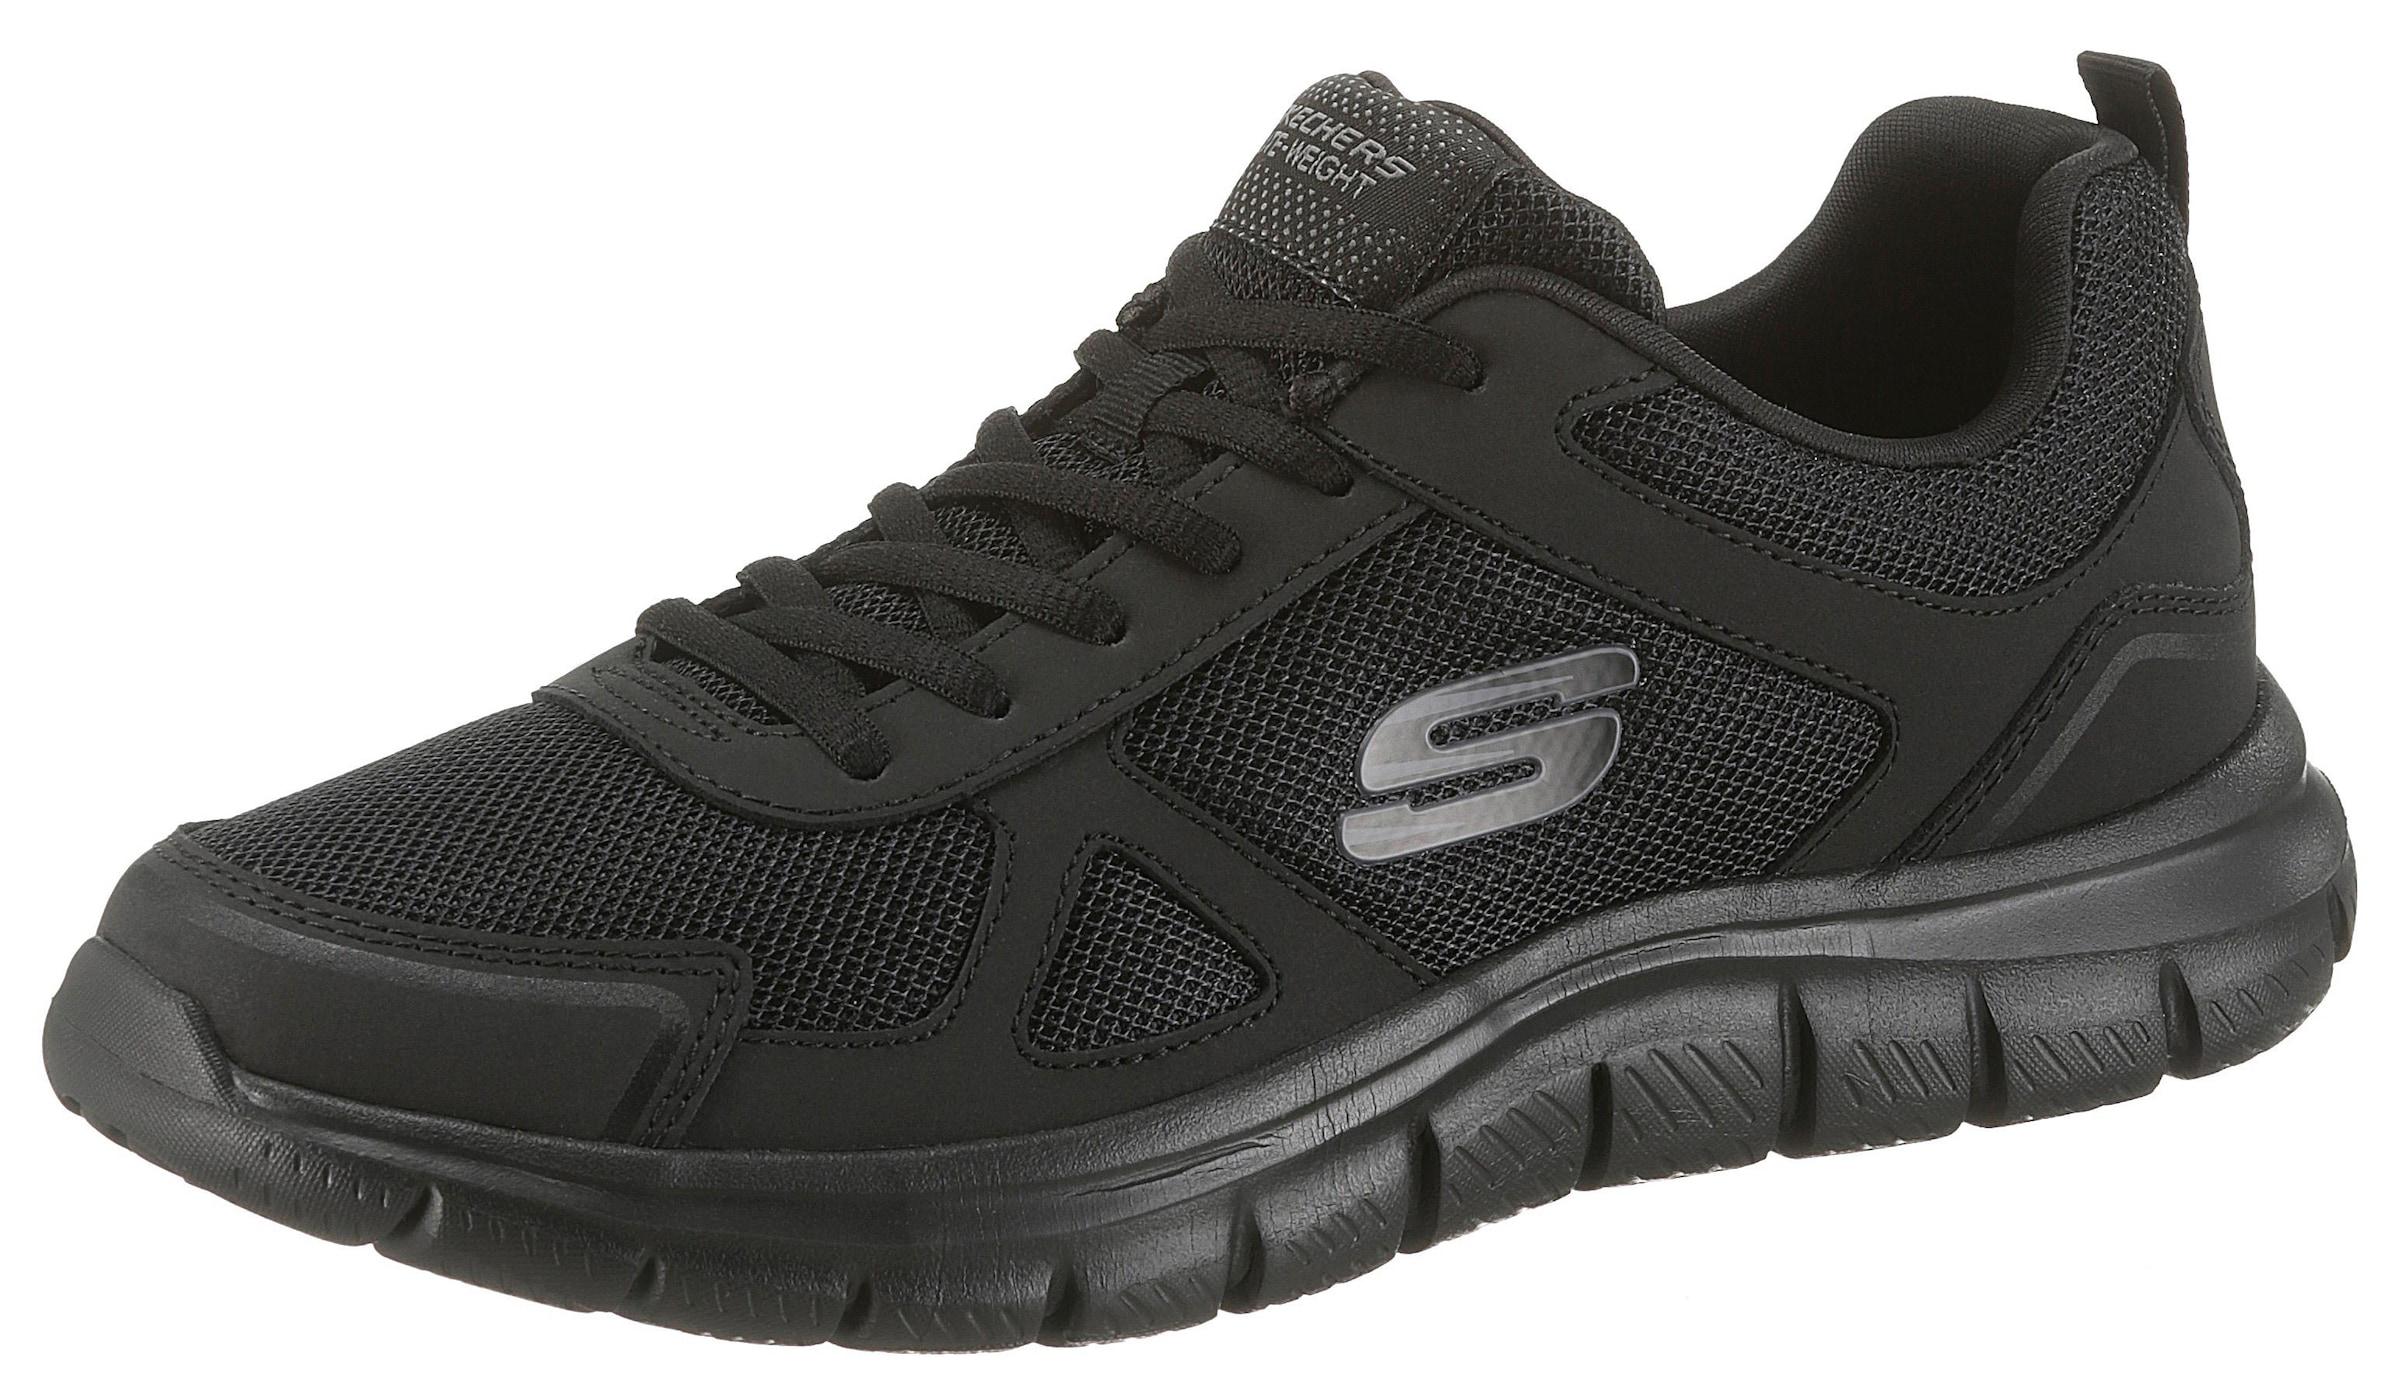 Skechers Sneaker Track Scloric online bestellen   Gutes Preis Leistungs Verhältnis,